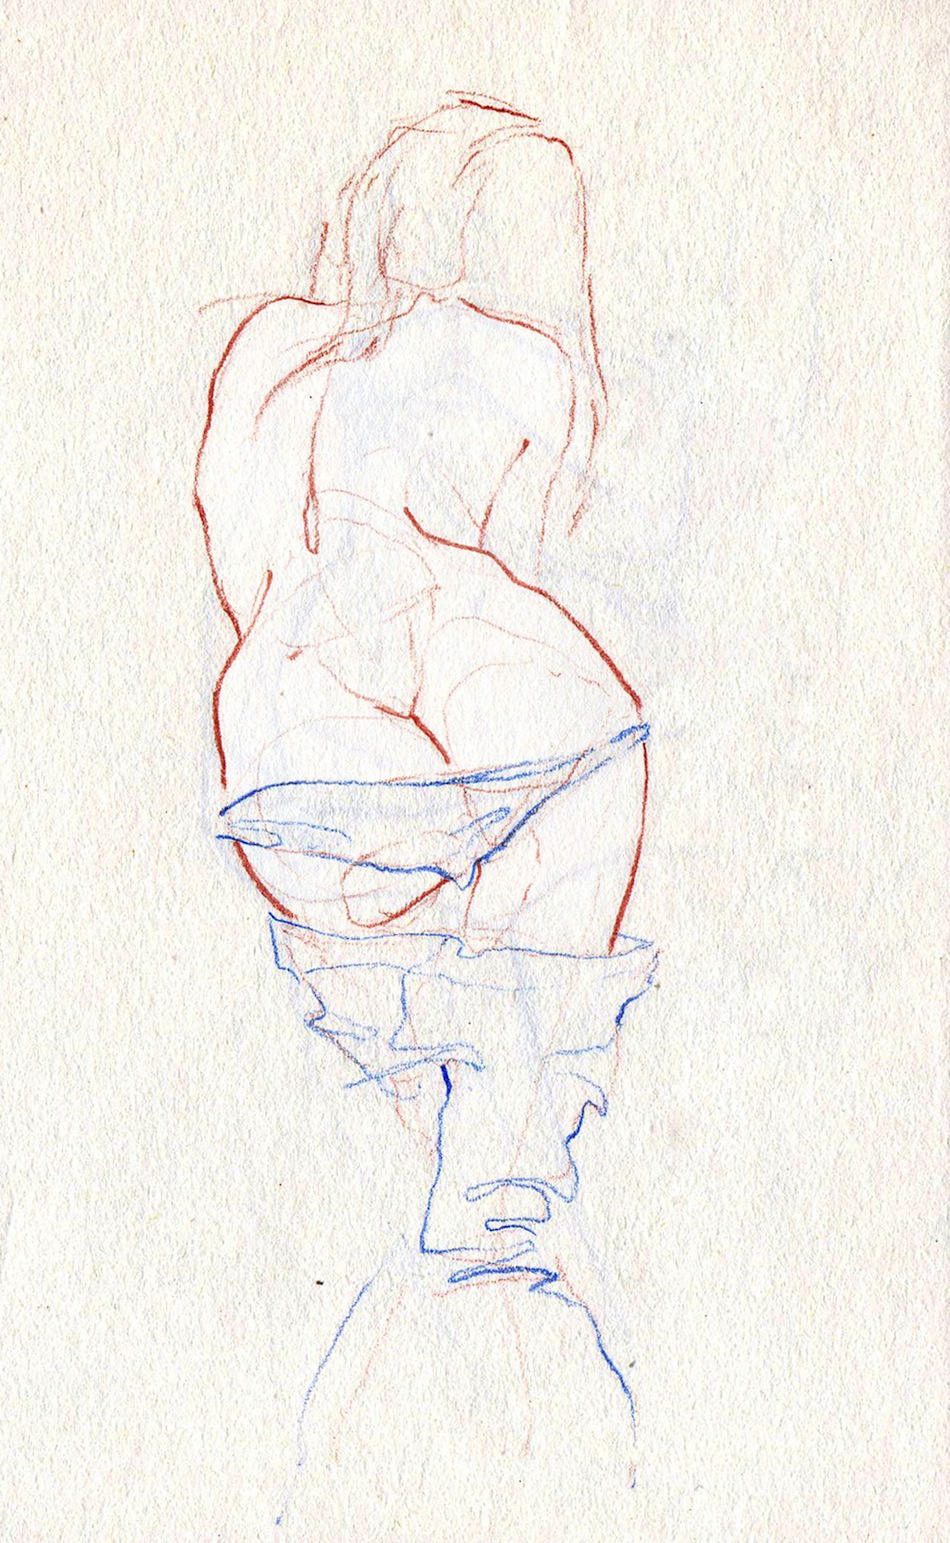 the-tree-mag_drawings-by-adara-snchez-anguiano-230.jpg